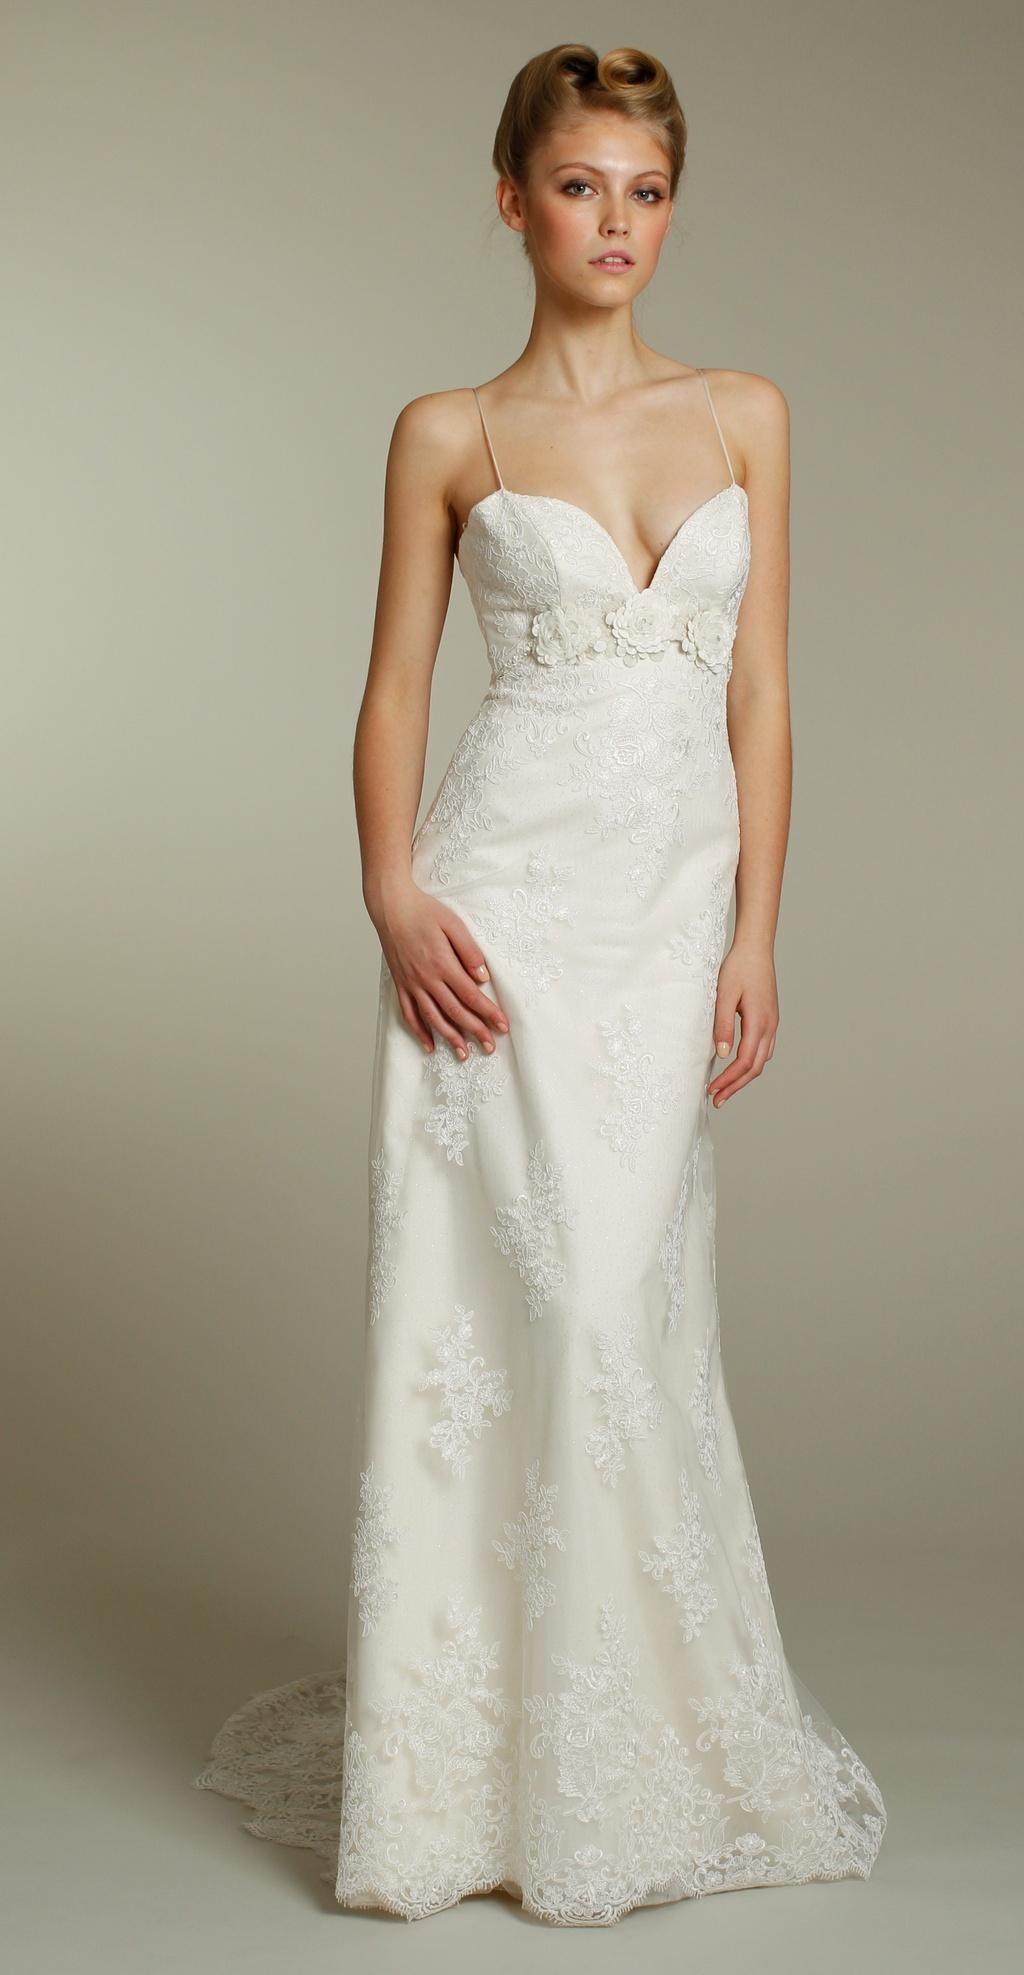 2157-wedding-dress-fall-2011-romantic-bridal-gowns.full